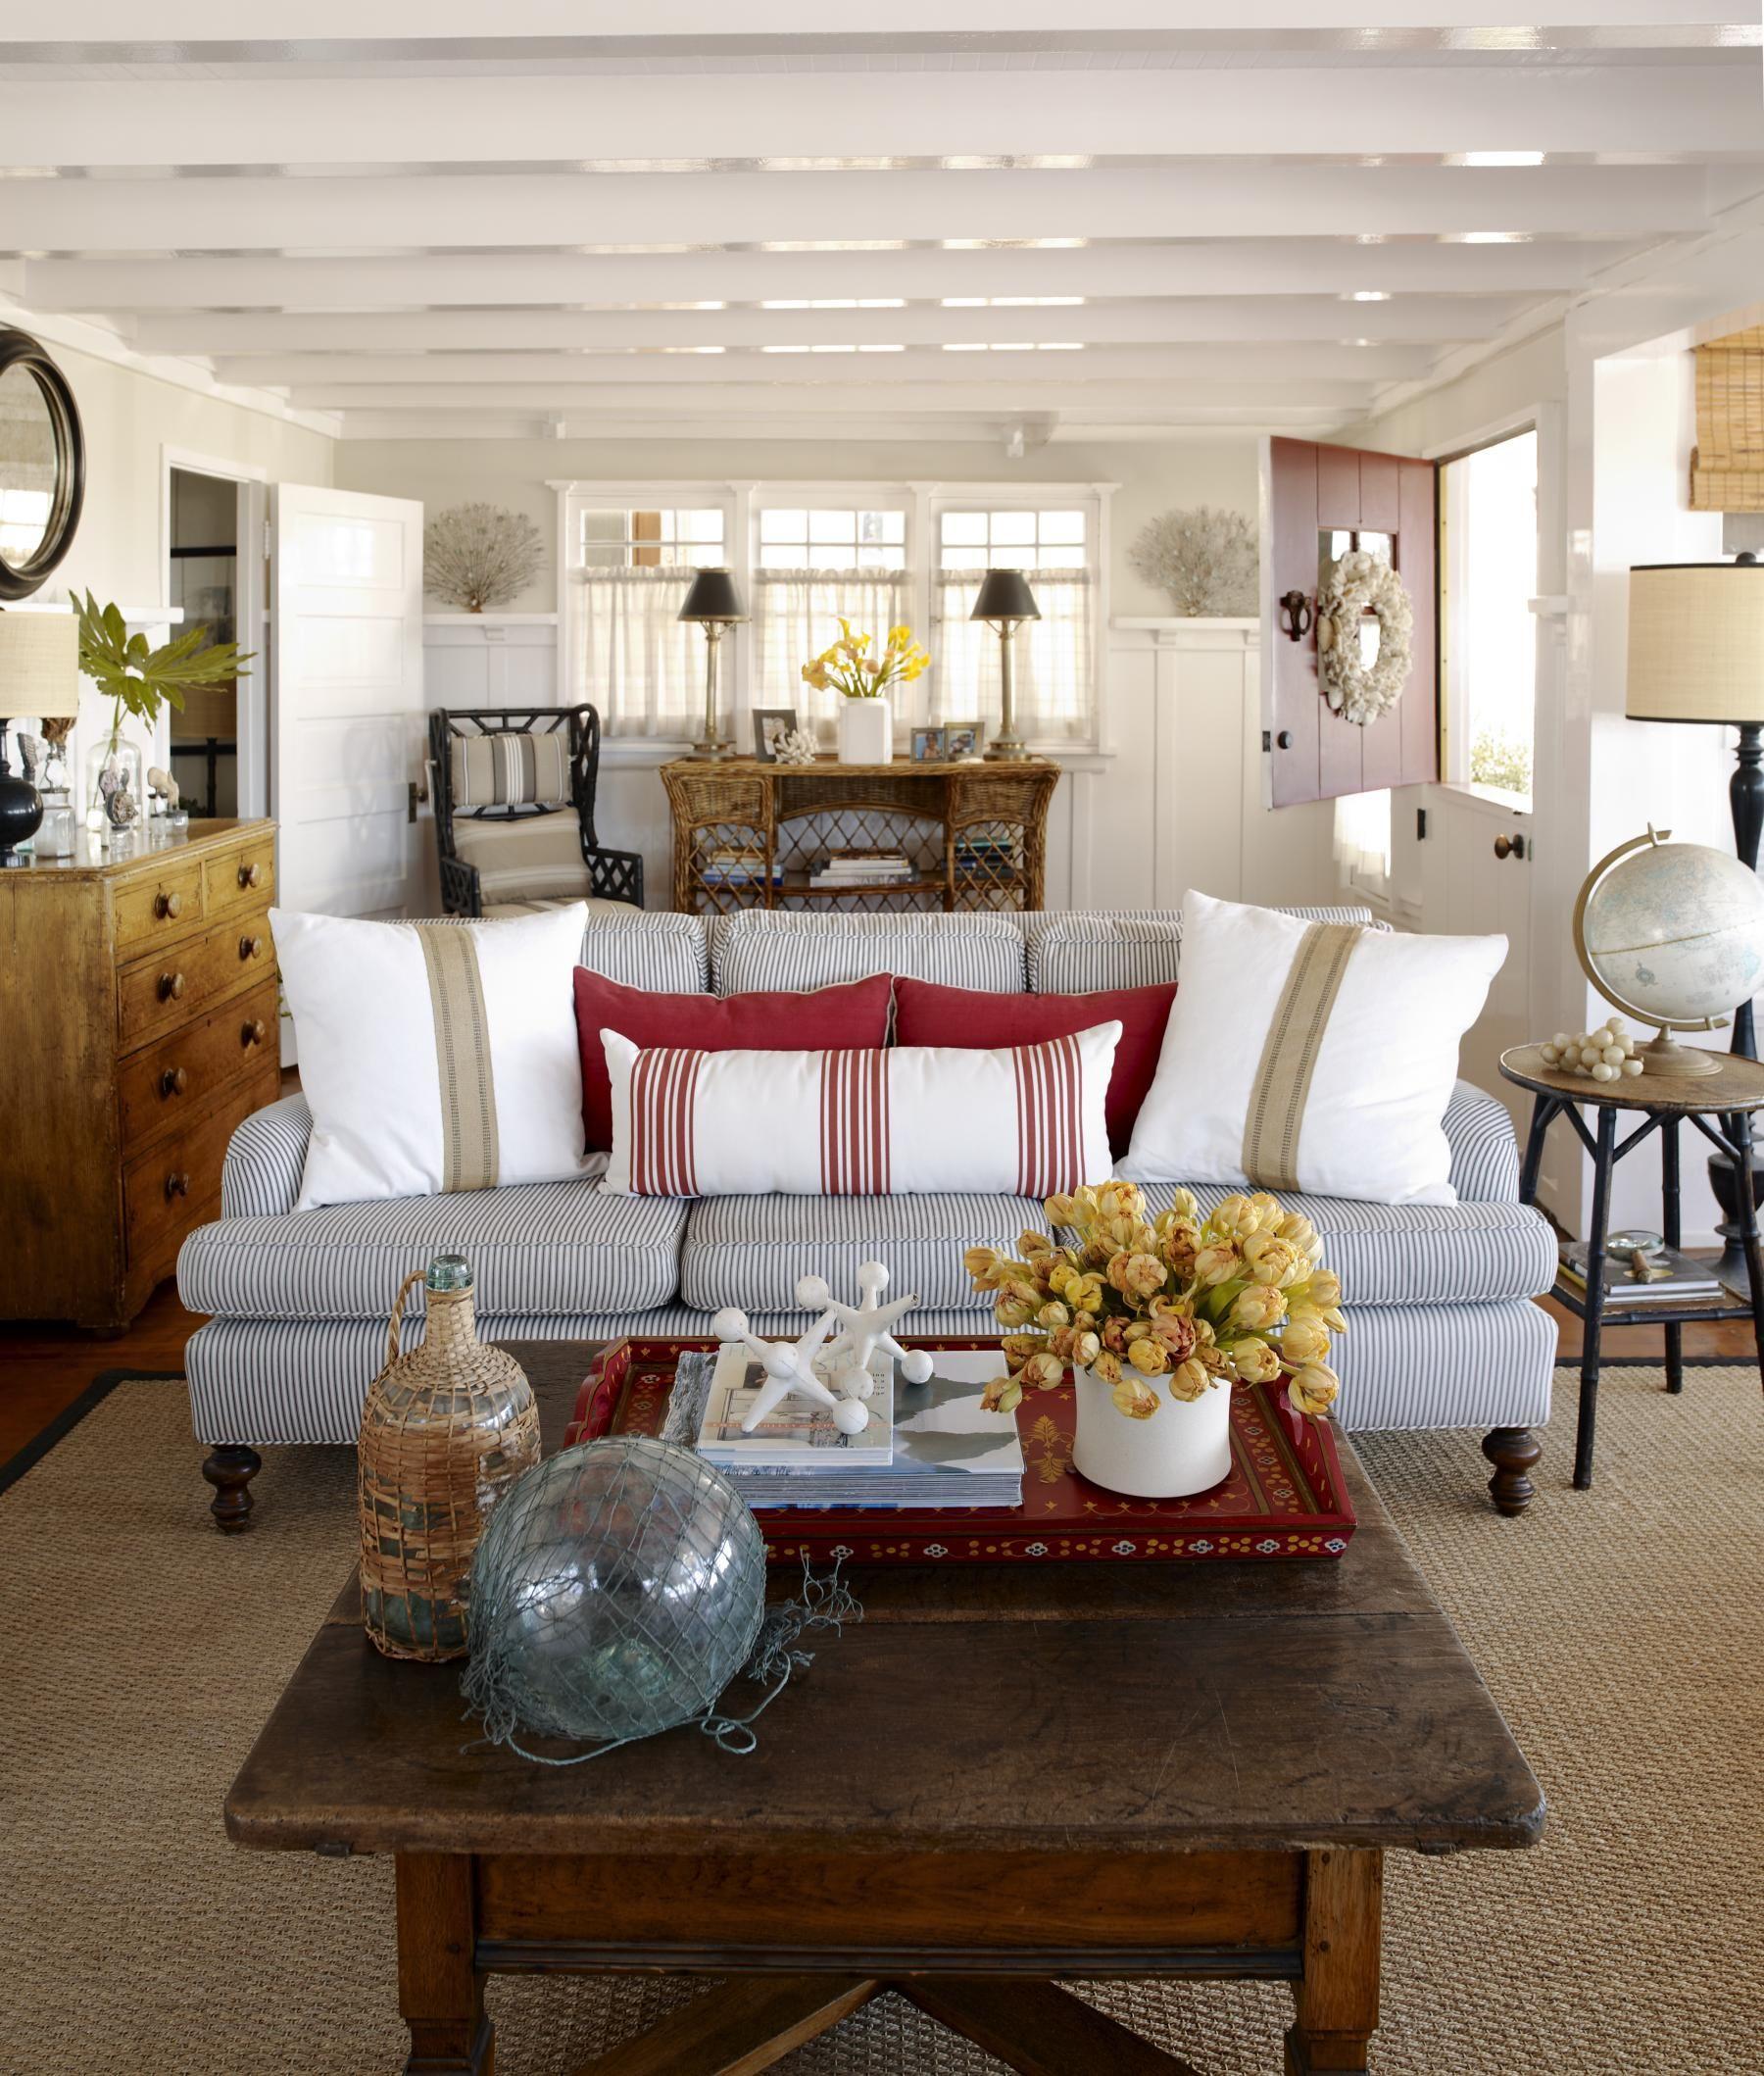 Spanish Design Colonial Architecture Luxury Decor Interior